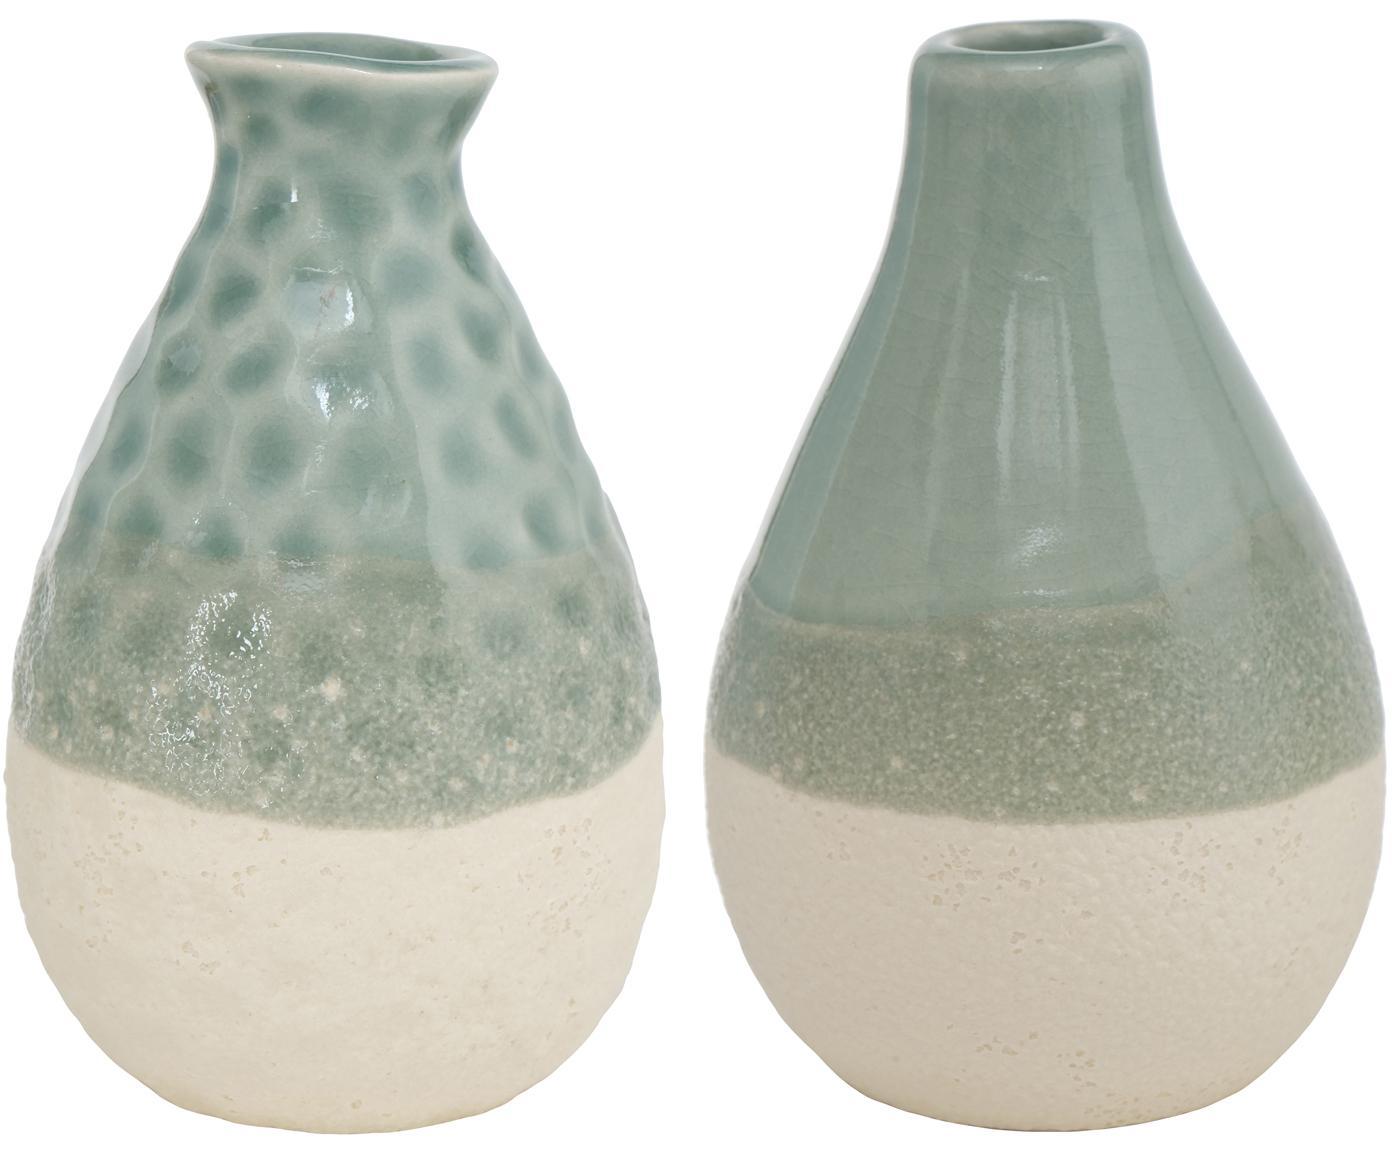 Set 2 vasi in terracotta Carney, Terracotta, Verde, beige, Ø 7 x Alt. 11 cm